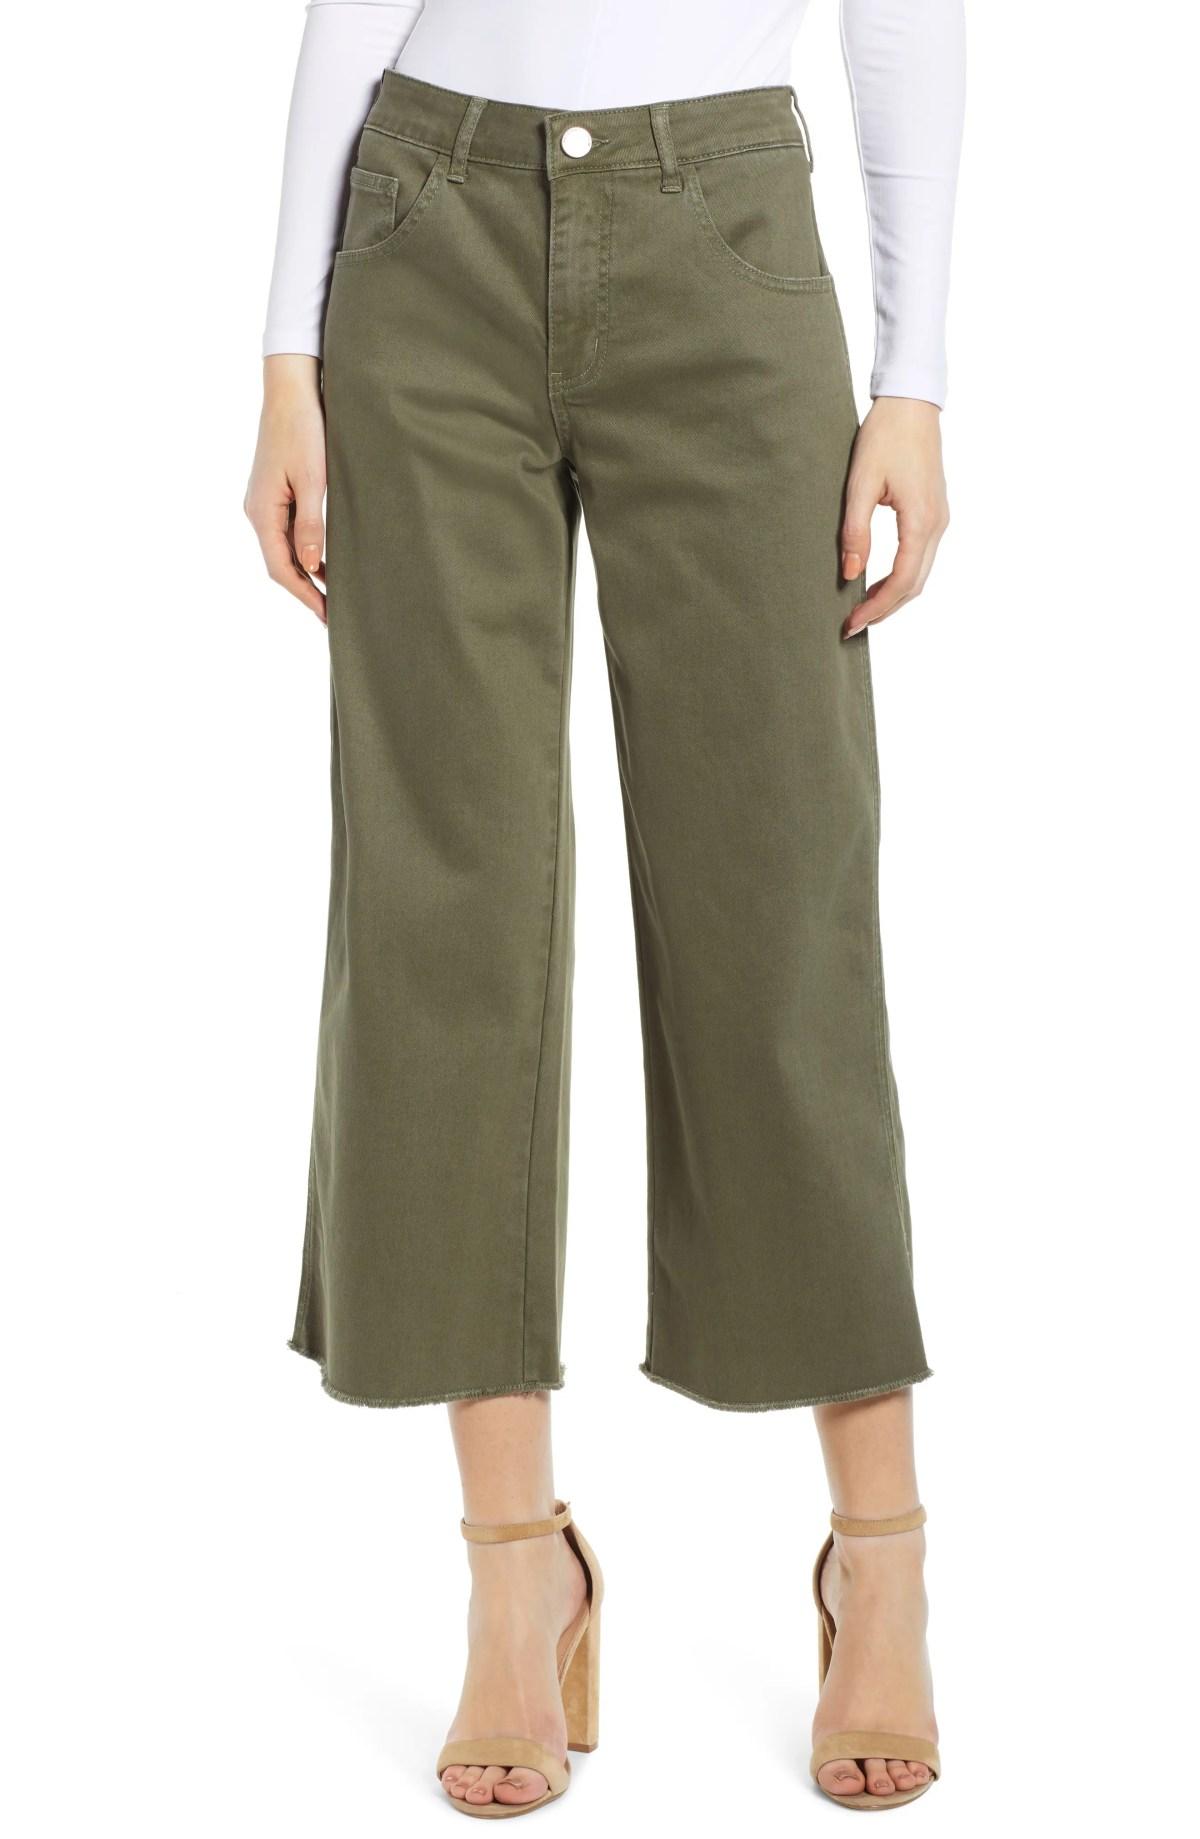 PROSPERITY DENIM Cargo Wide Leg Crop Jeans, Main, color, OLIVE